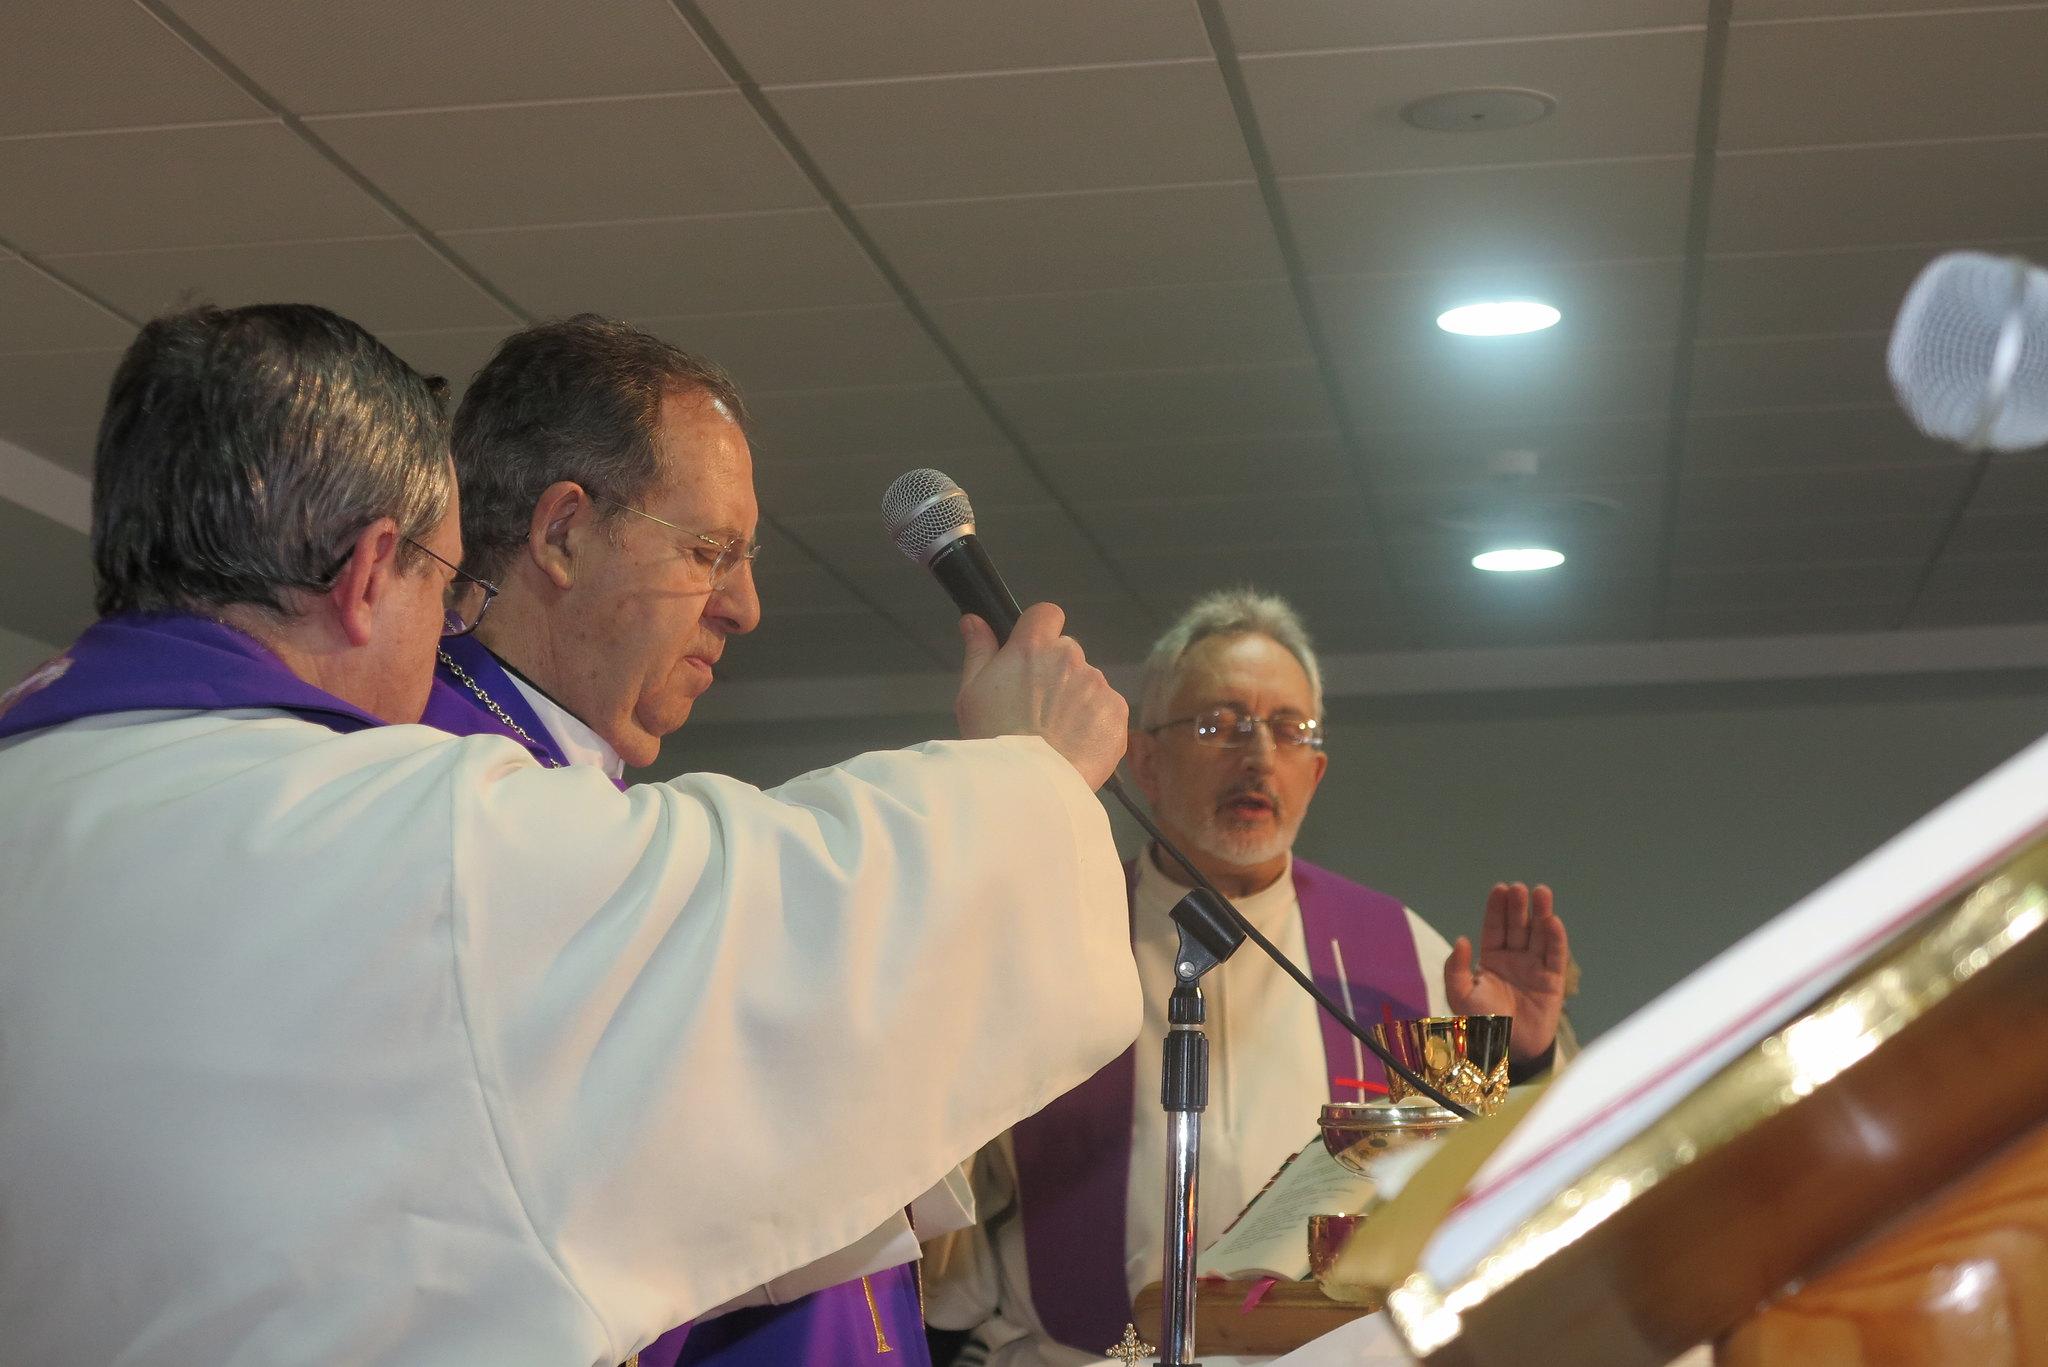 (2016-02-13) - Inauguración Virgen de Lourdes, La Molineta - Archivo La Molineta 2 (33)